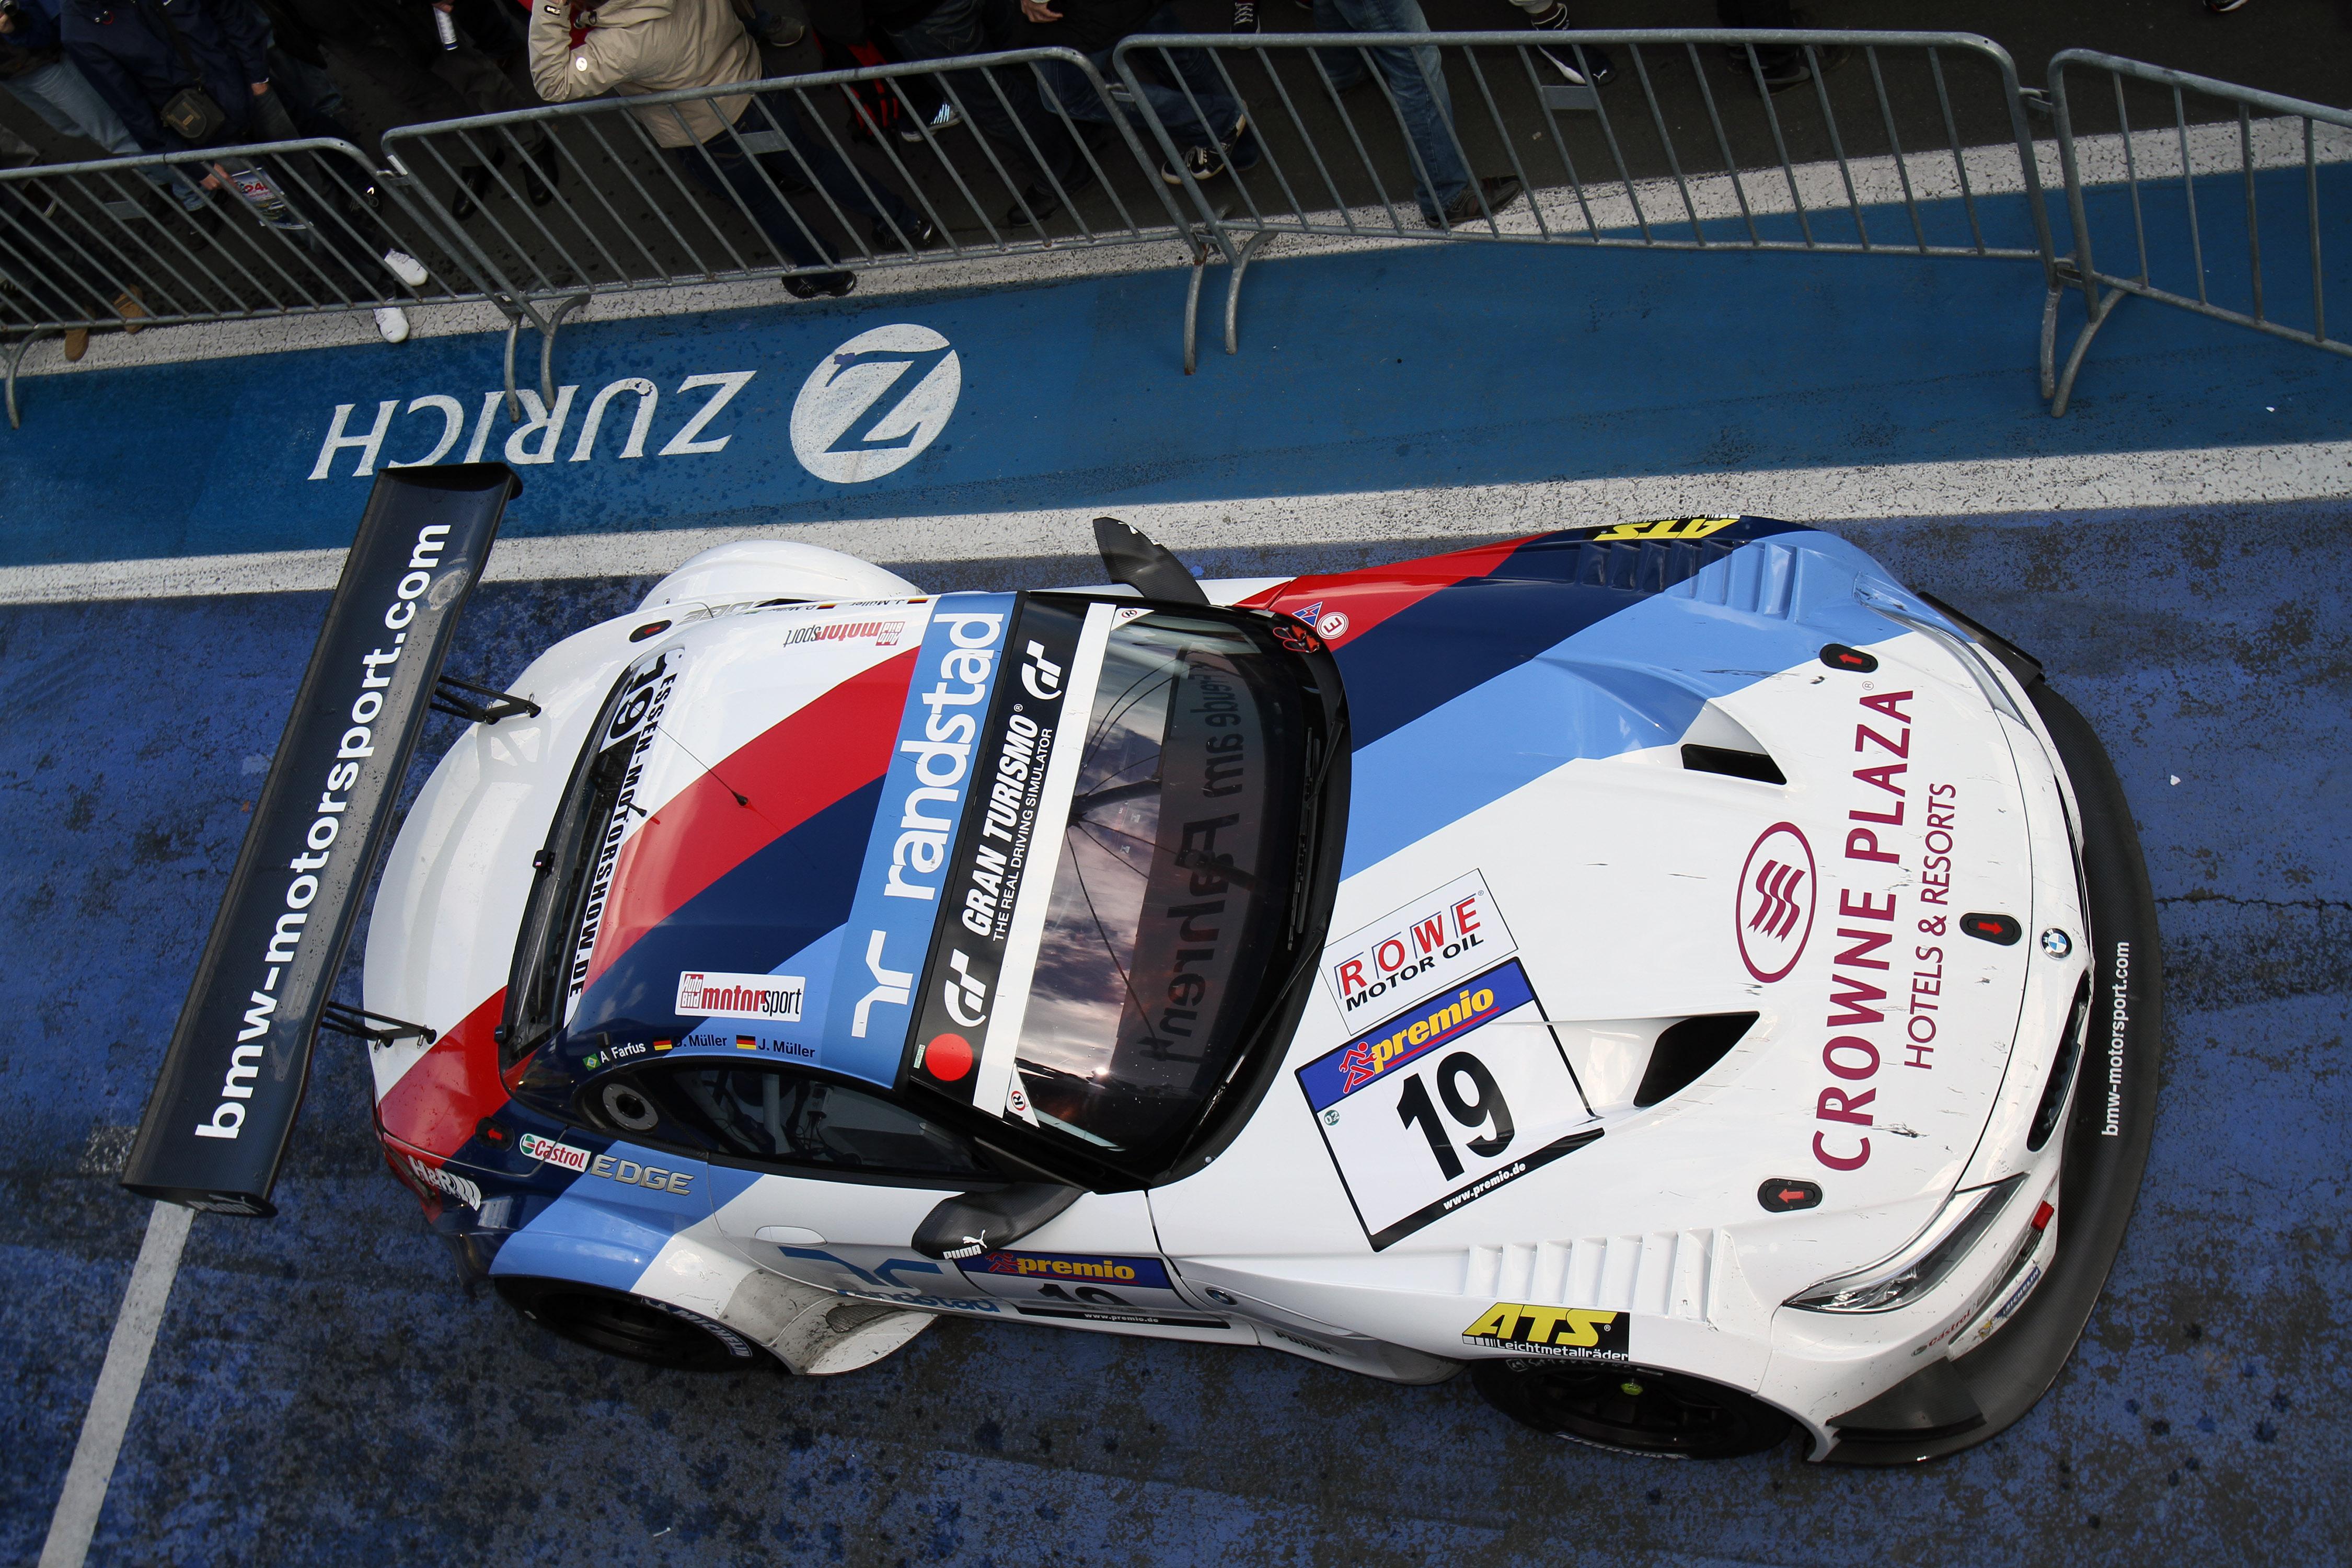 Motor Racing - VLN DMV 4-Stunden-Rennen, Round 2, Nurburgring, Germany